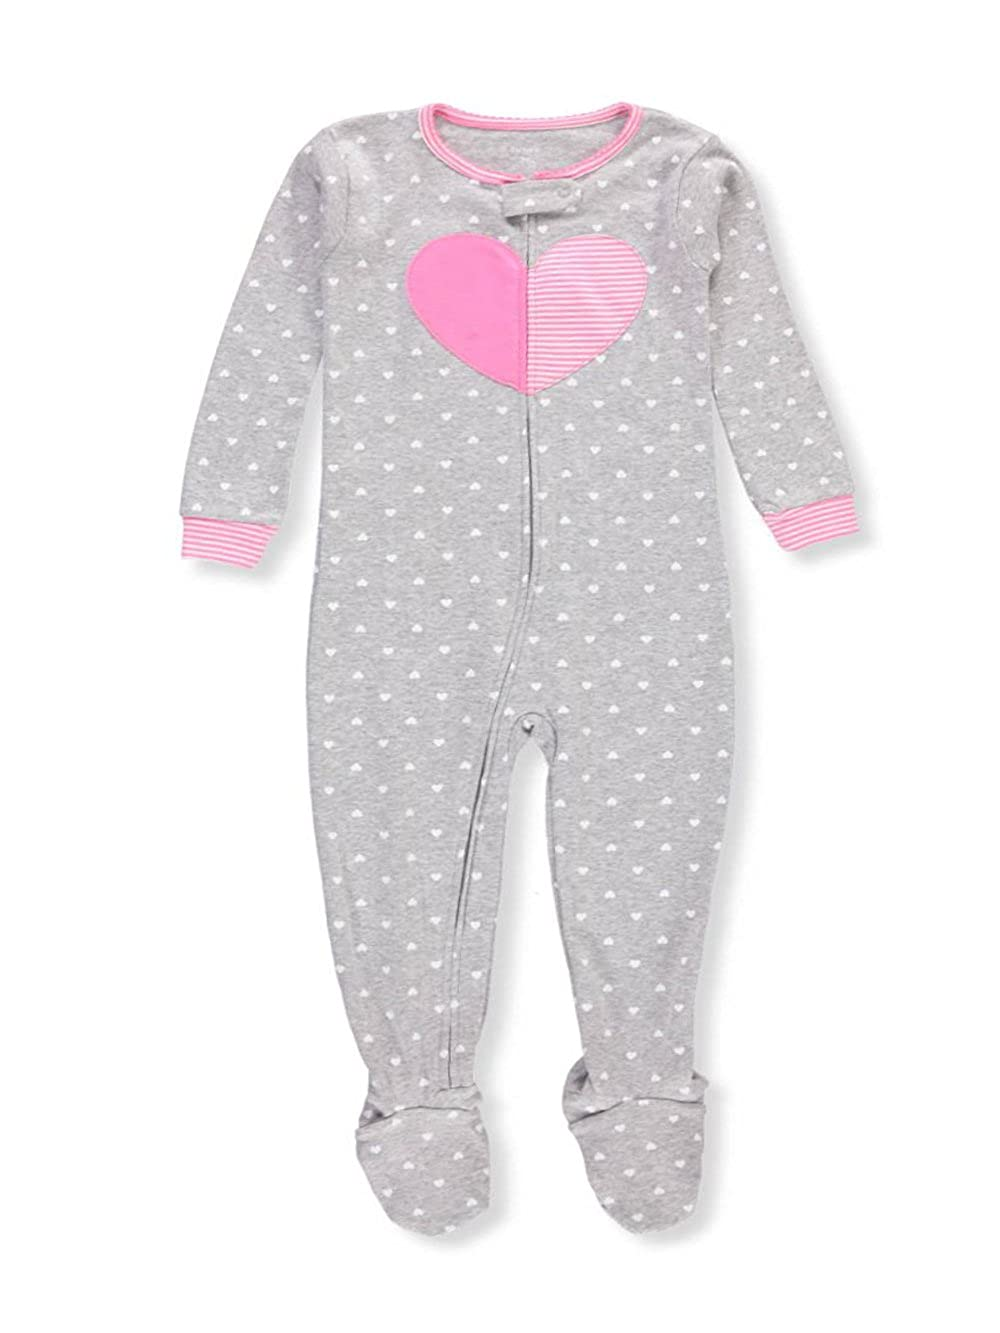 c4e193eec3ee Amazon.com  Carter s Little Girls  1 Piece Snug Fit Cotton Pajamas ...